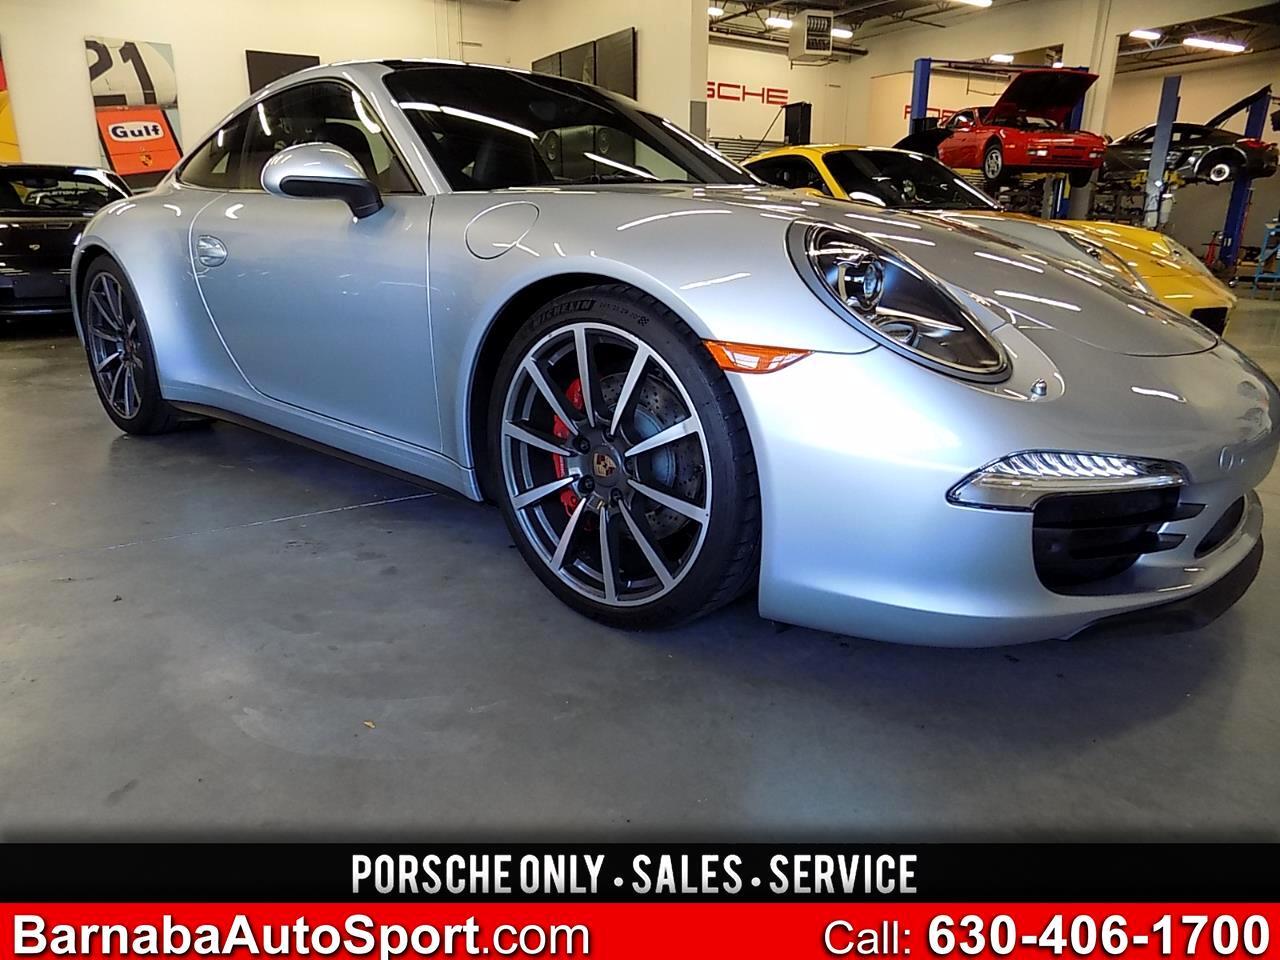 Porsche 911 Carrera 4S Coupe 2014